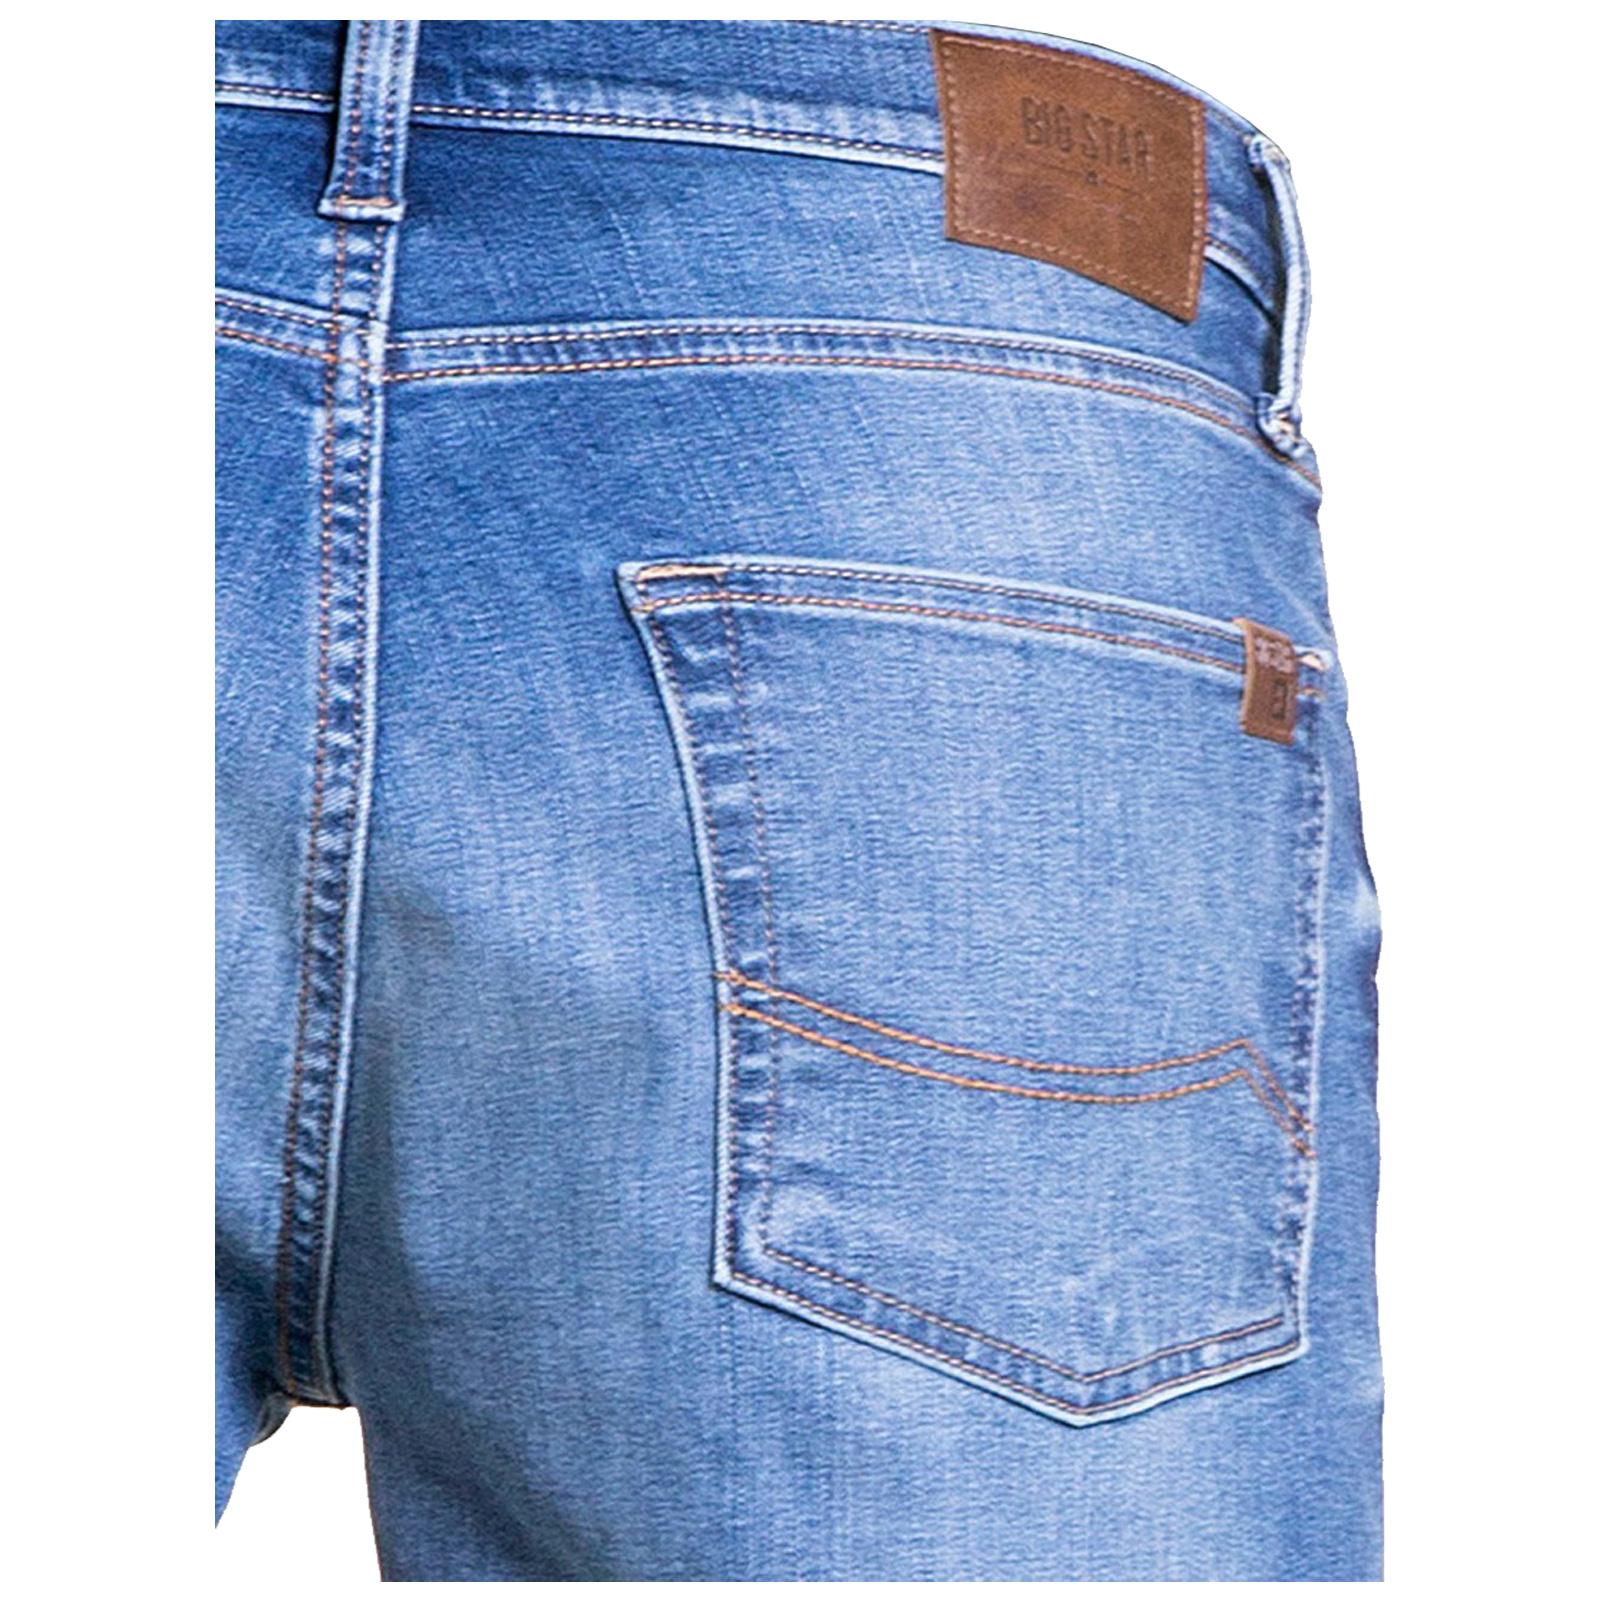 Big-Star-Mens-Denim-Jeans-Straight-Tapered-Leg-Style-Designer-Casual-Trousers thumbnail 3